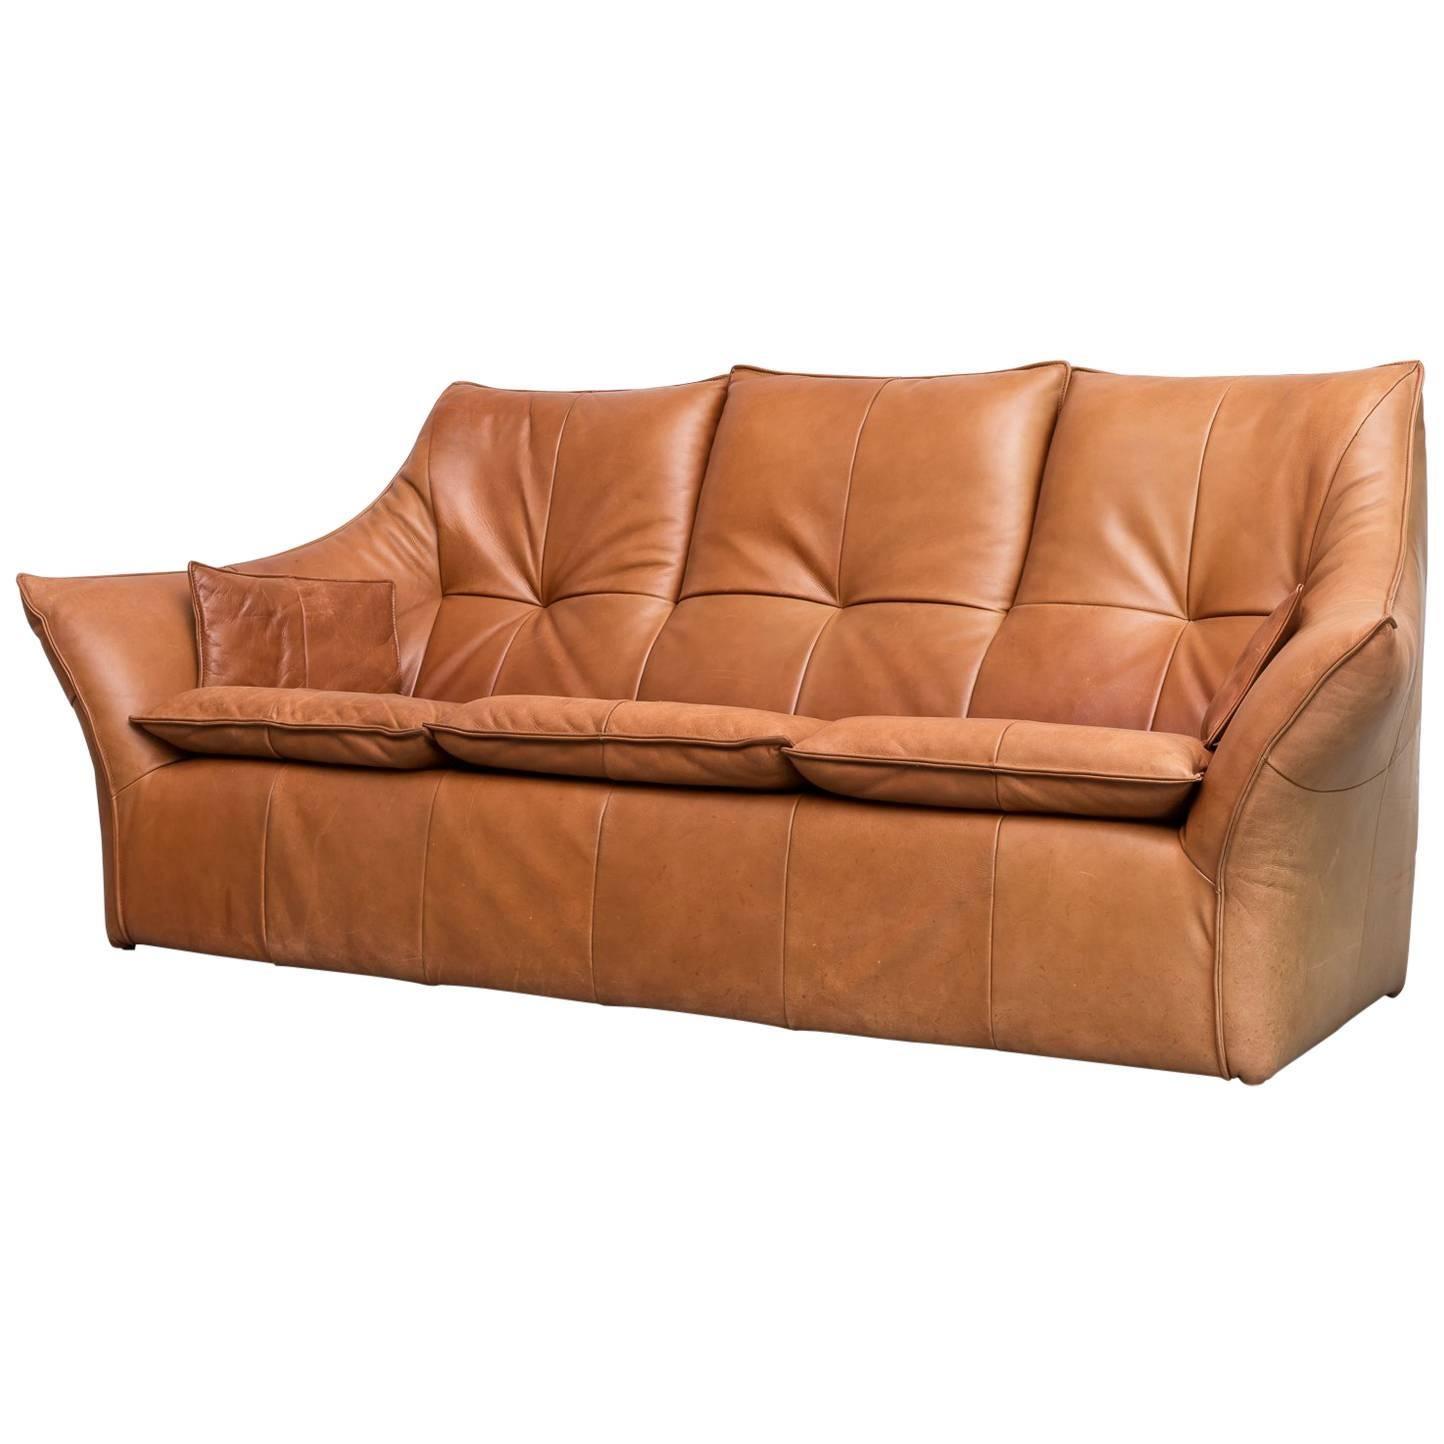 Gerard Van Den Berg Denver Three Seat Sofa